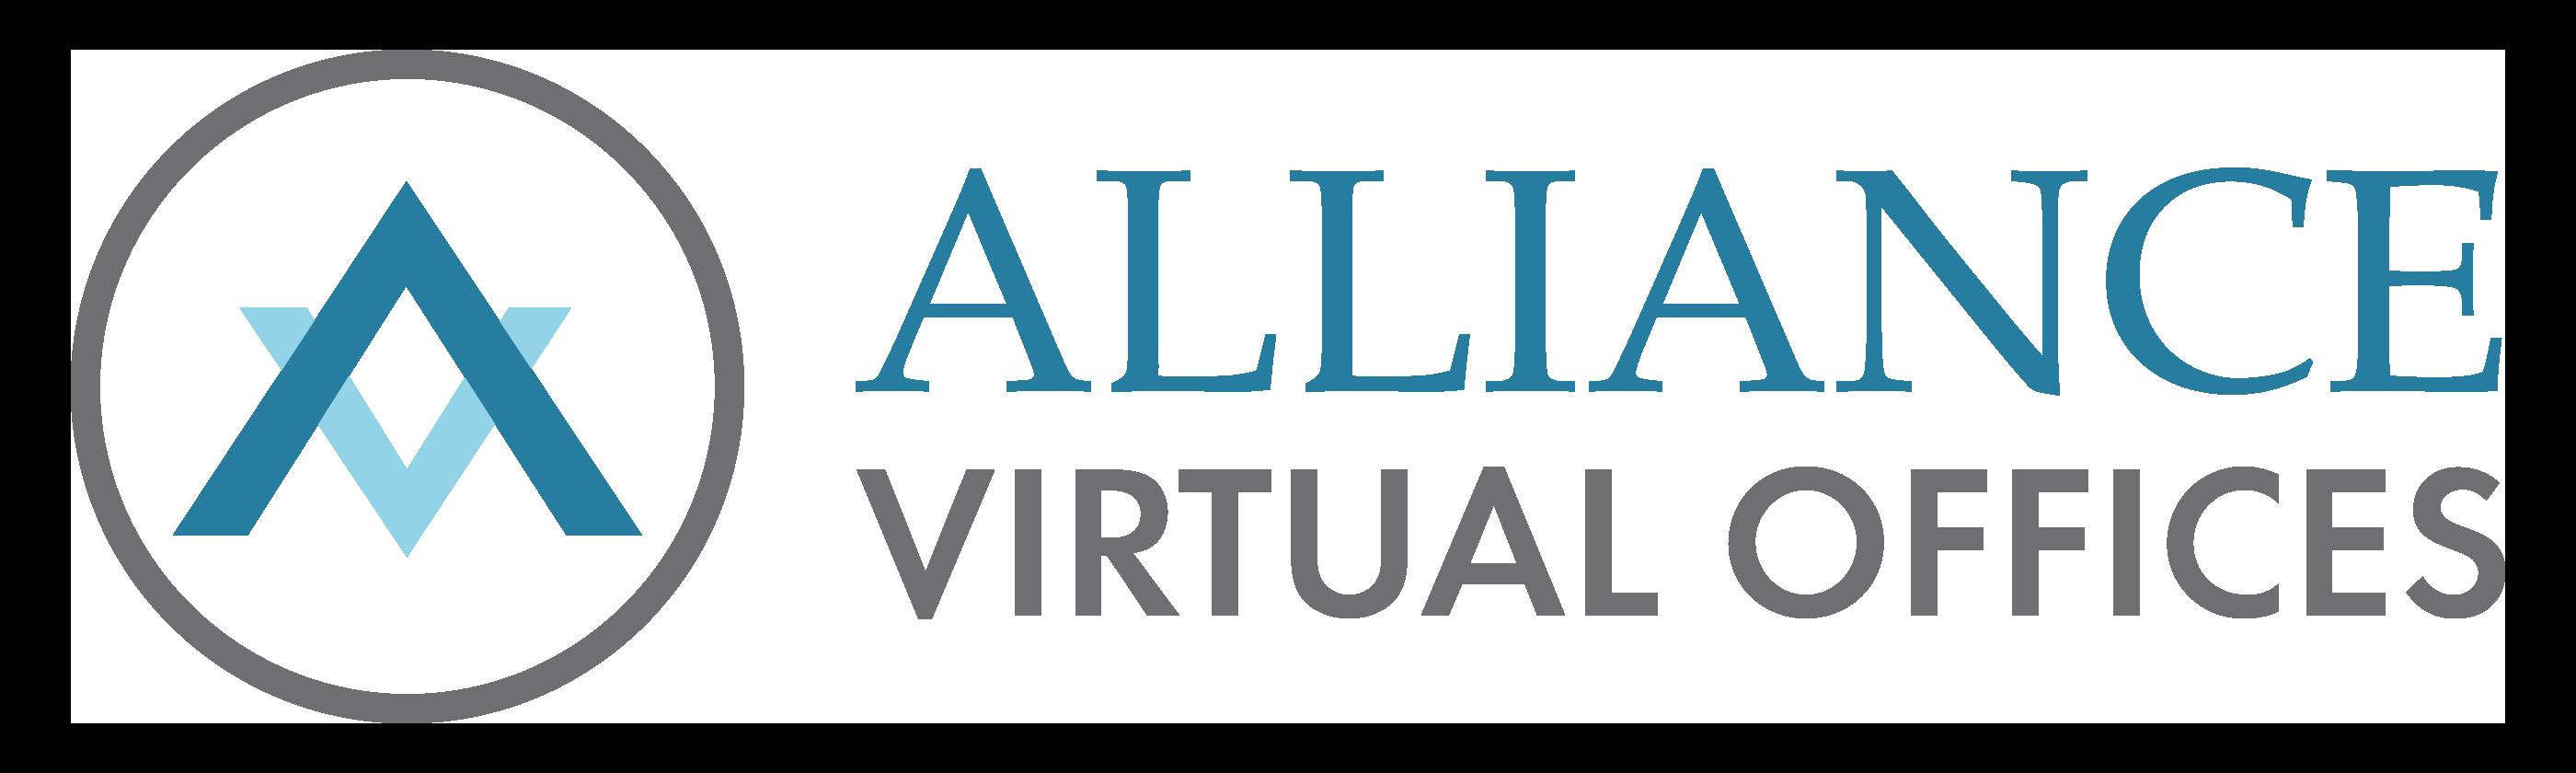 https://anysizedealsweek.com/wp-content/uploads/2020/05/Alliance-Virtual-Offices-Logo.png